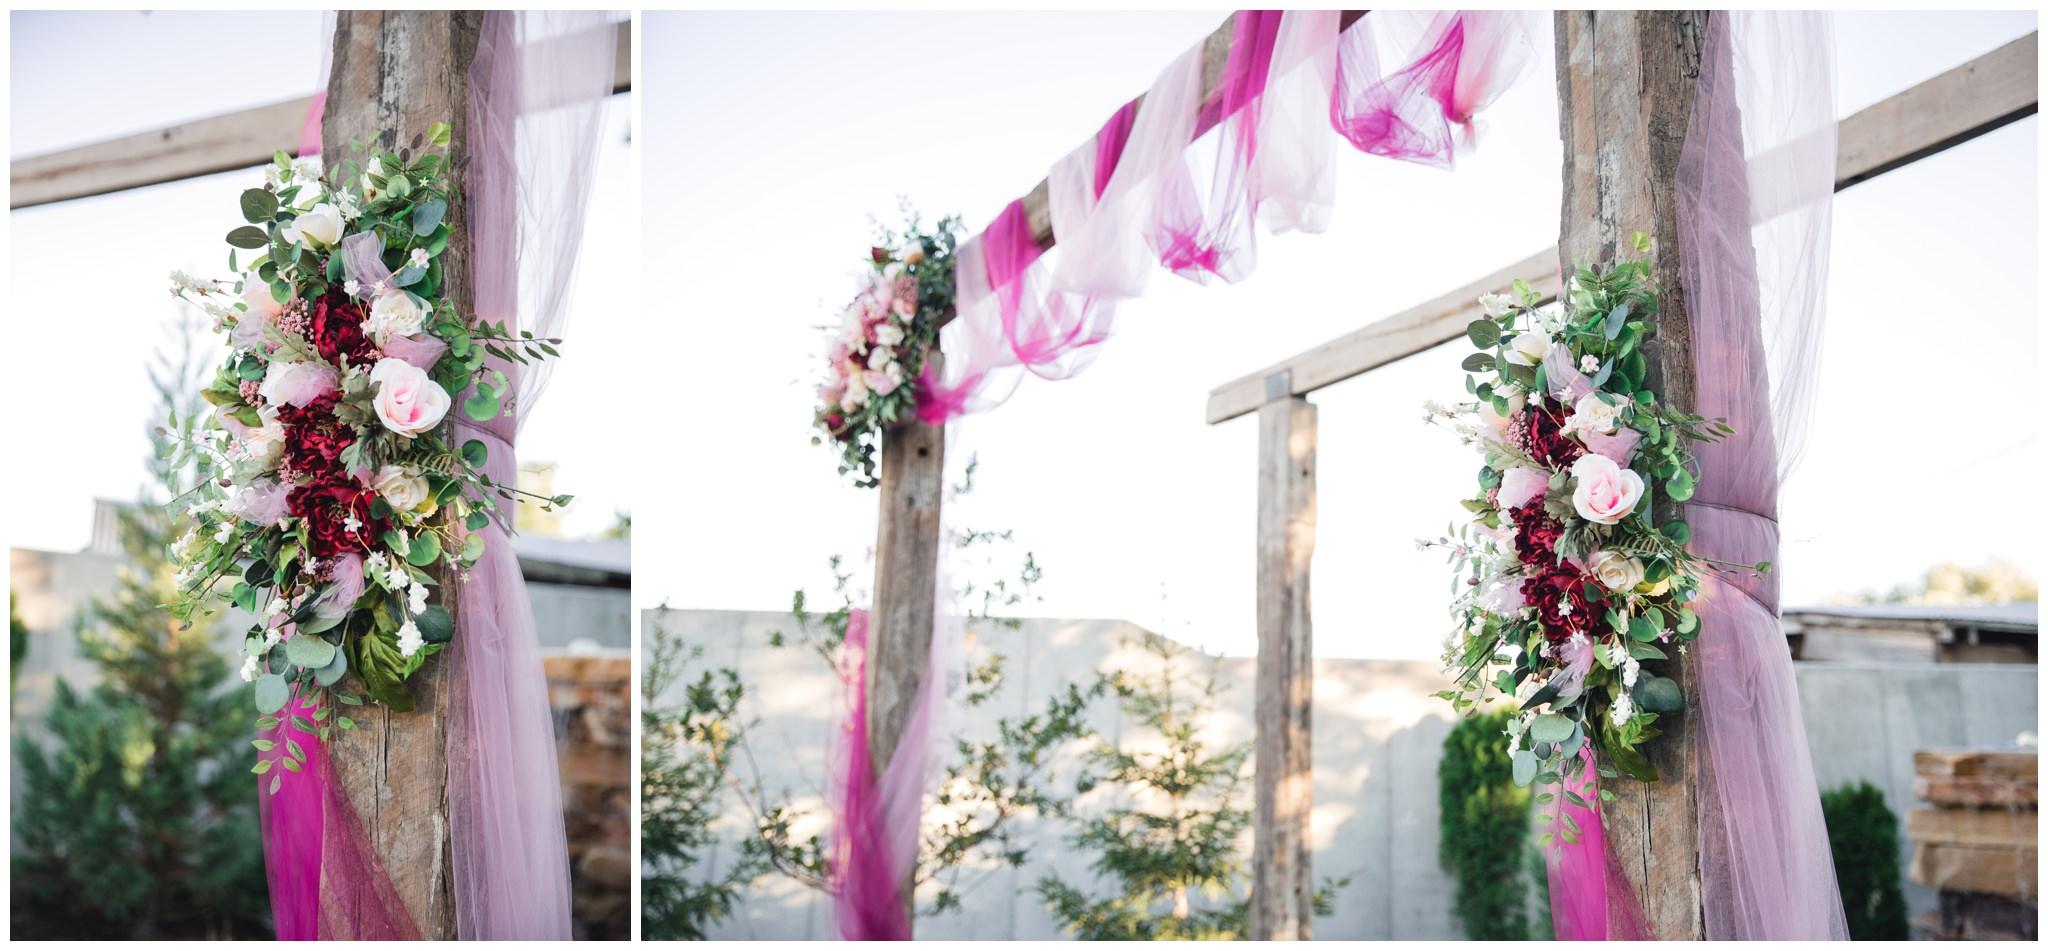 detail pictures of burgundy floral arrangements at wedding in Lindon, Utah.